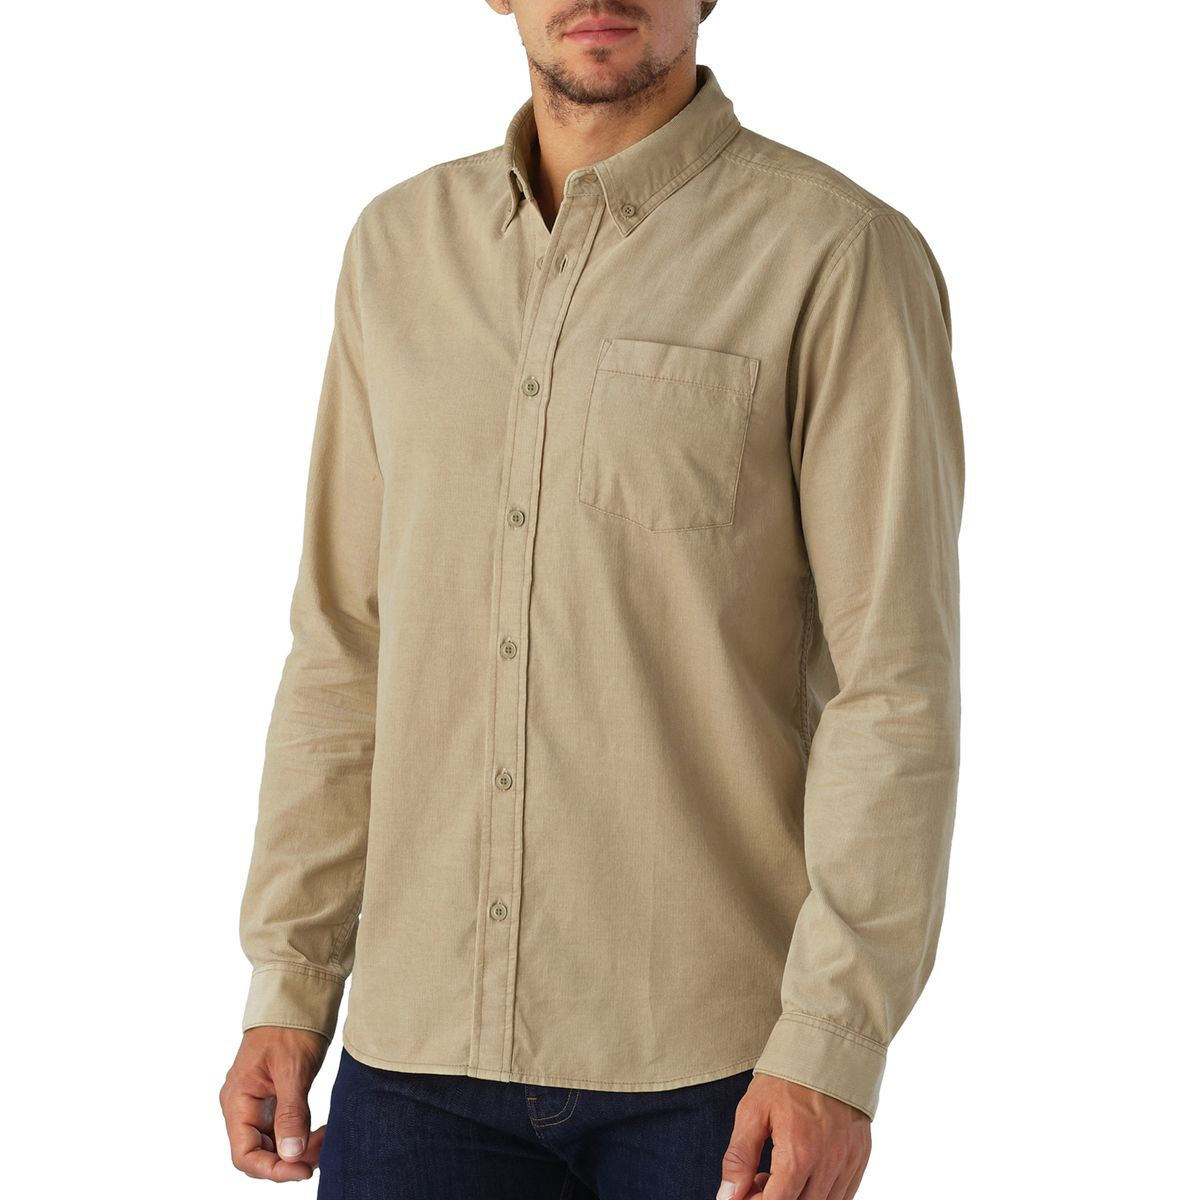 Patagonia Bluffside Cord Shirt - Men